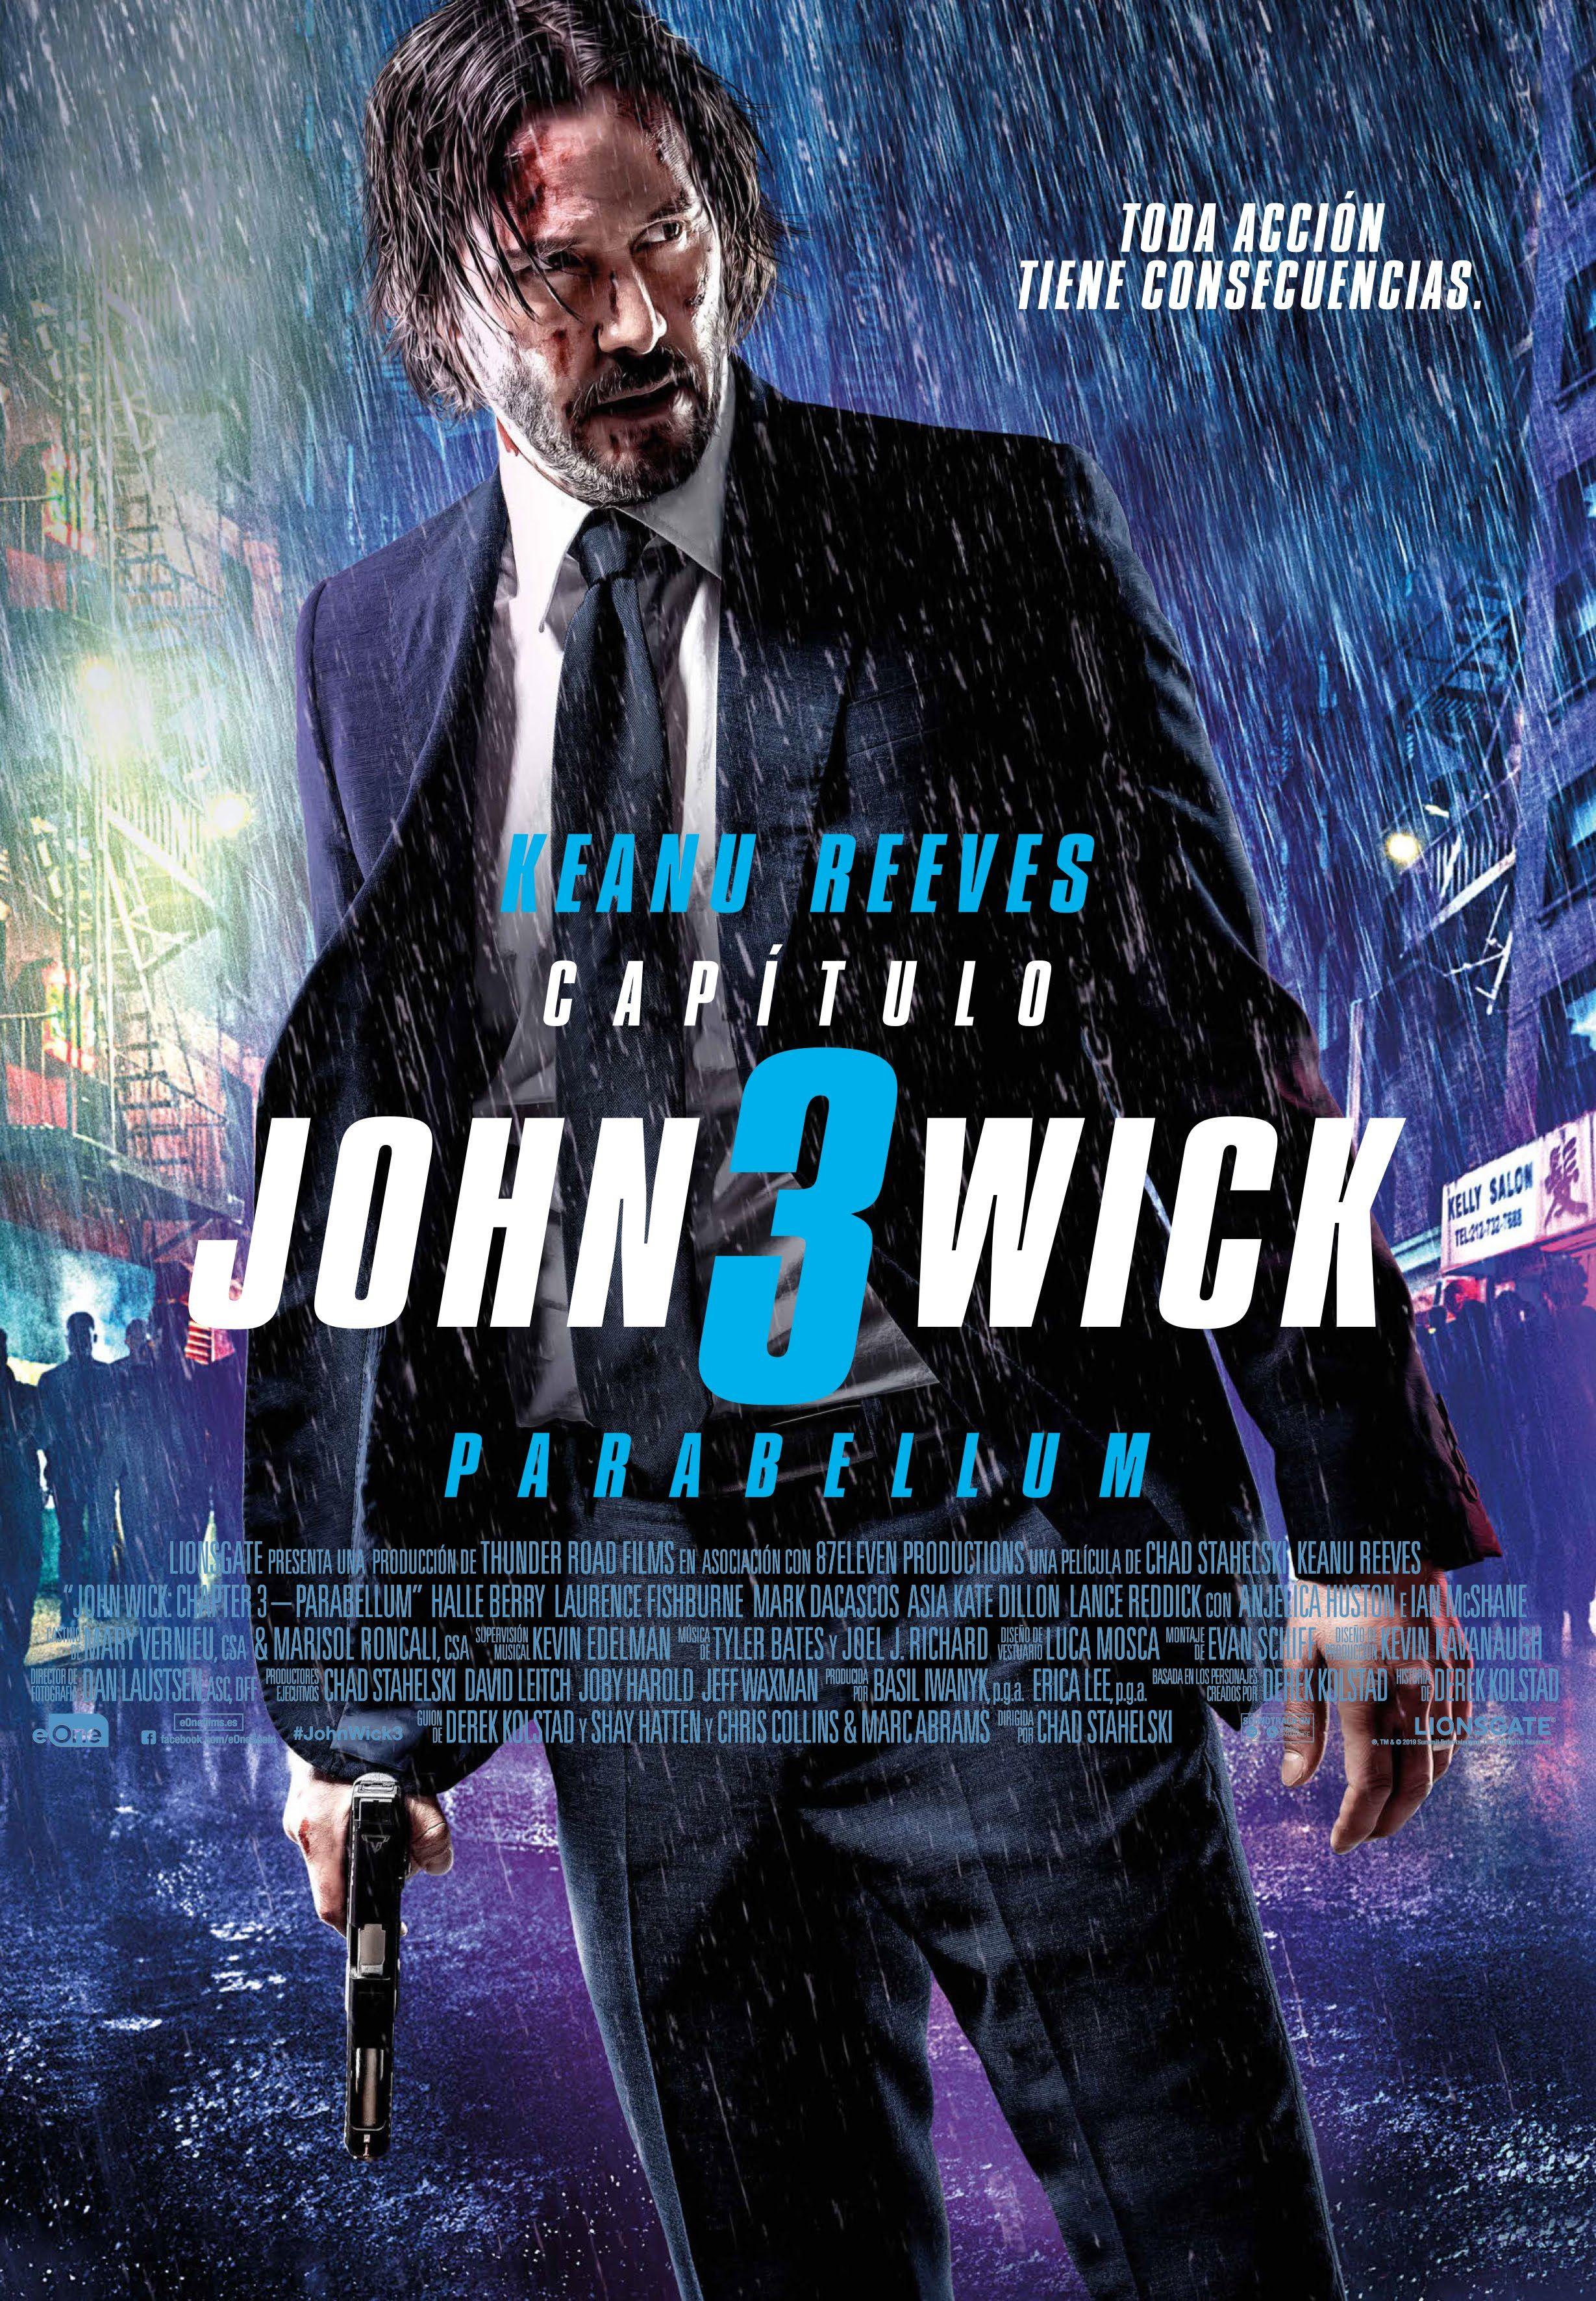 John Wick Capitulo 3 Parabellum John Wick Ver Peliculas En Linea Peliculas Completas